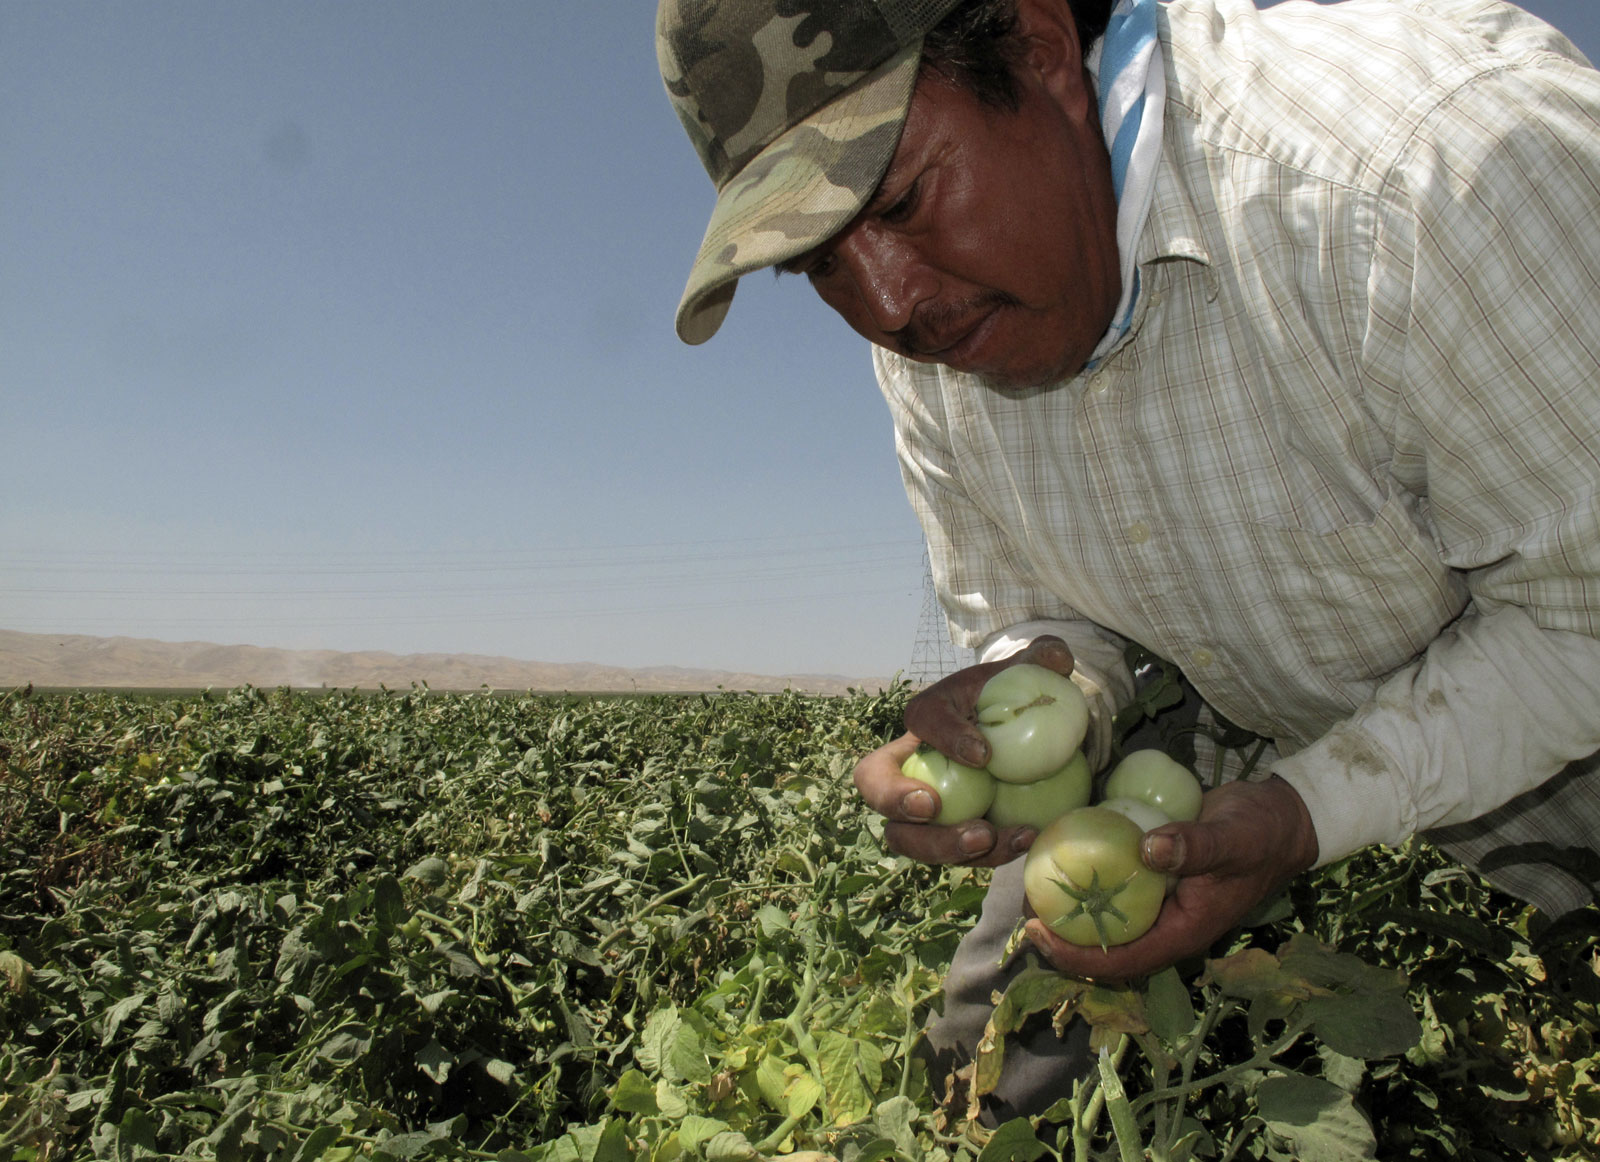 Campesinos en California